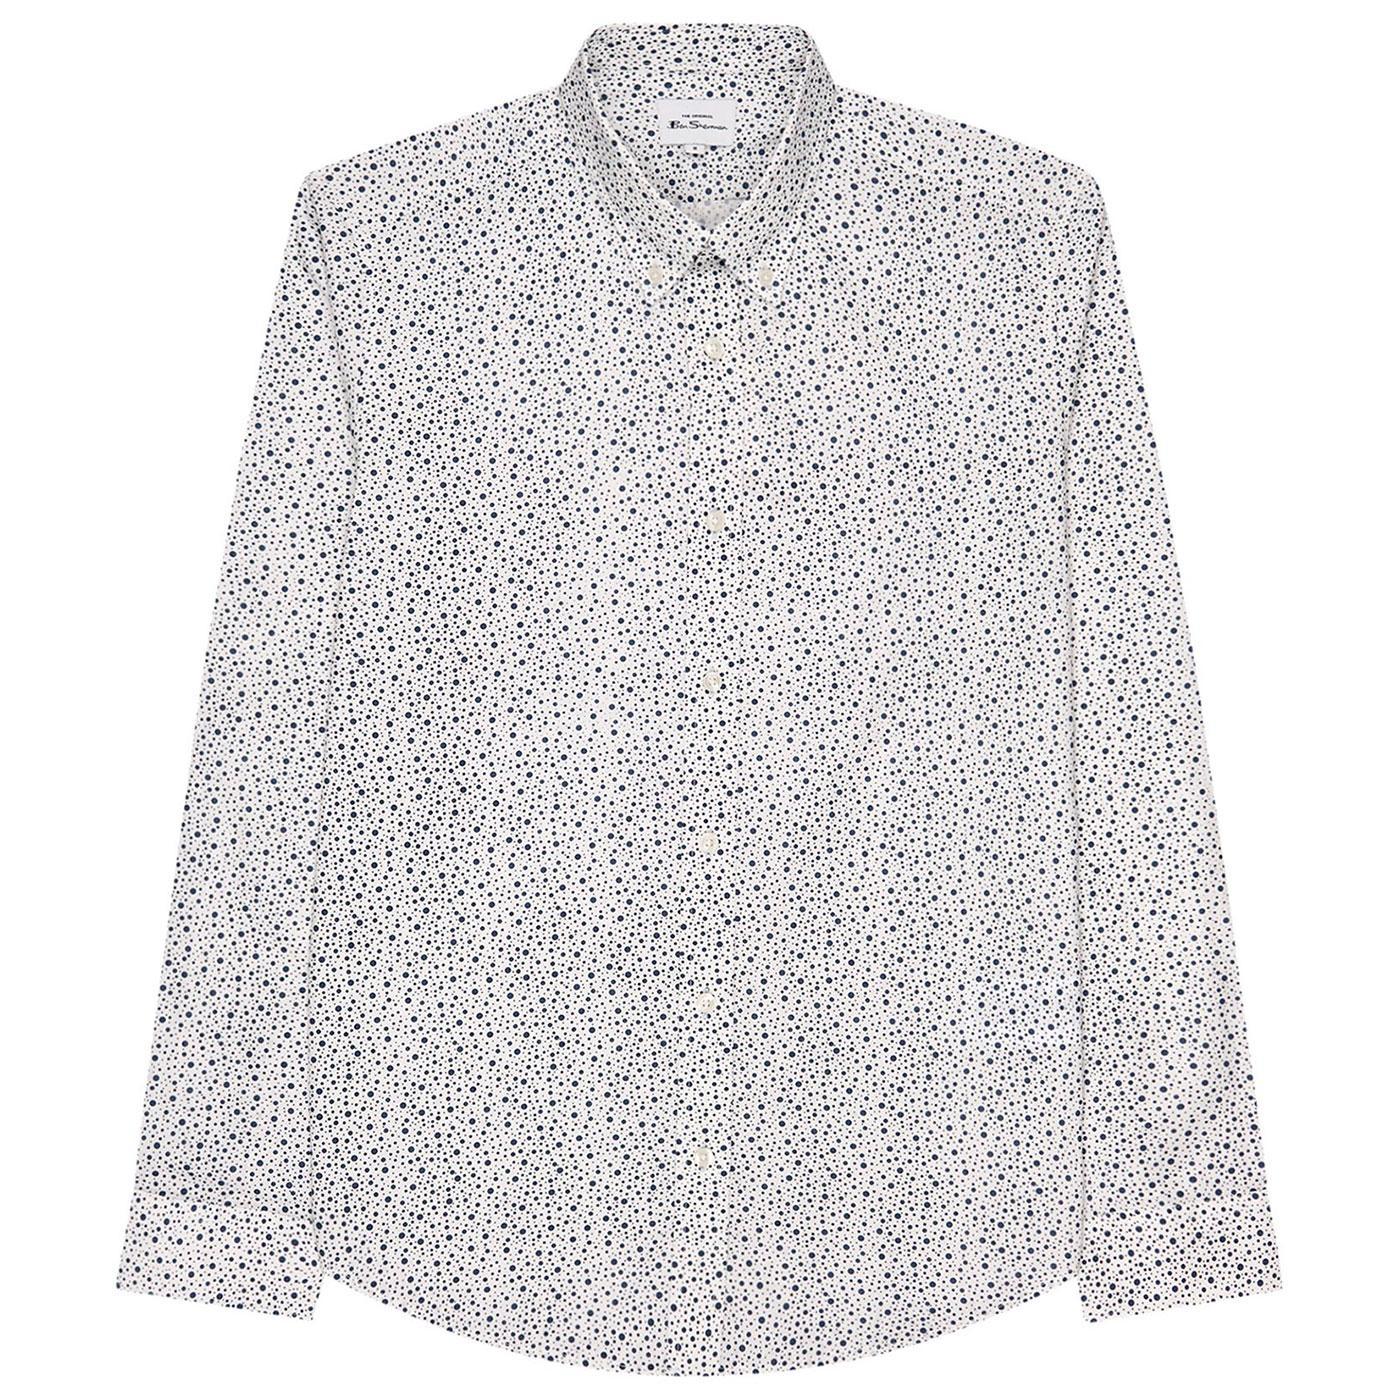 BEN SHERMAN Retro Mod Irregular Spot Print Shirt